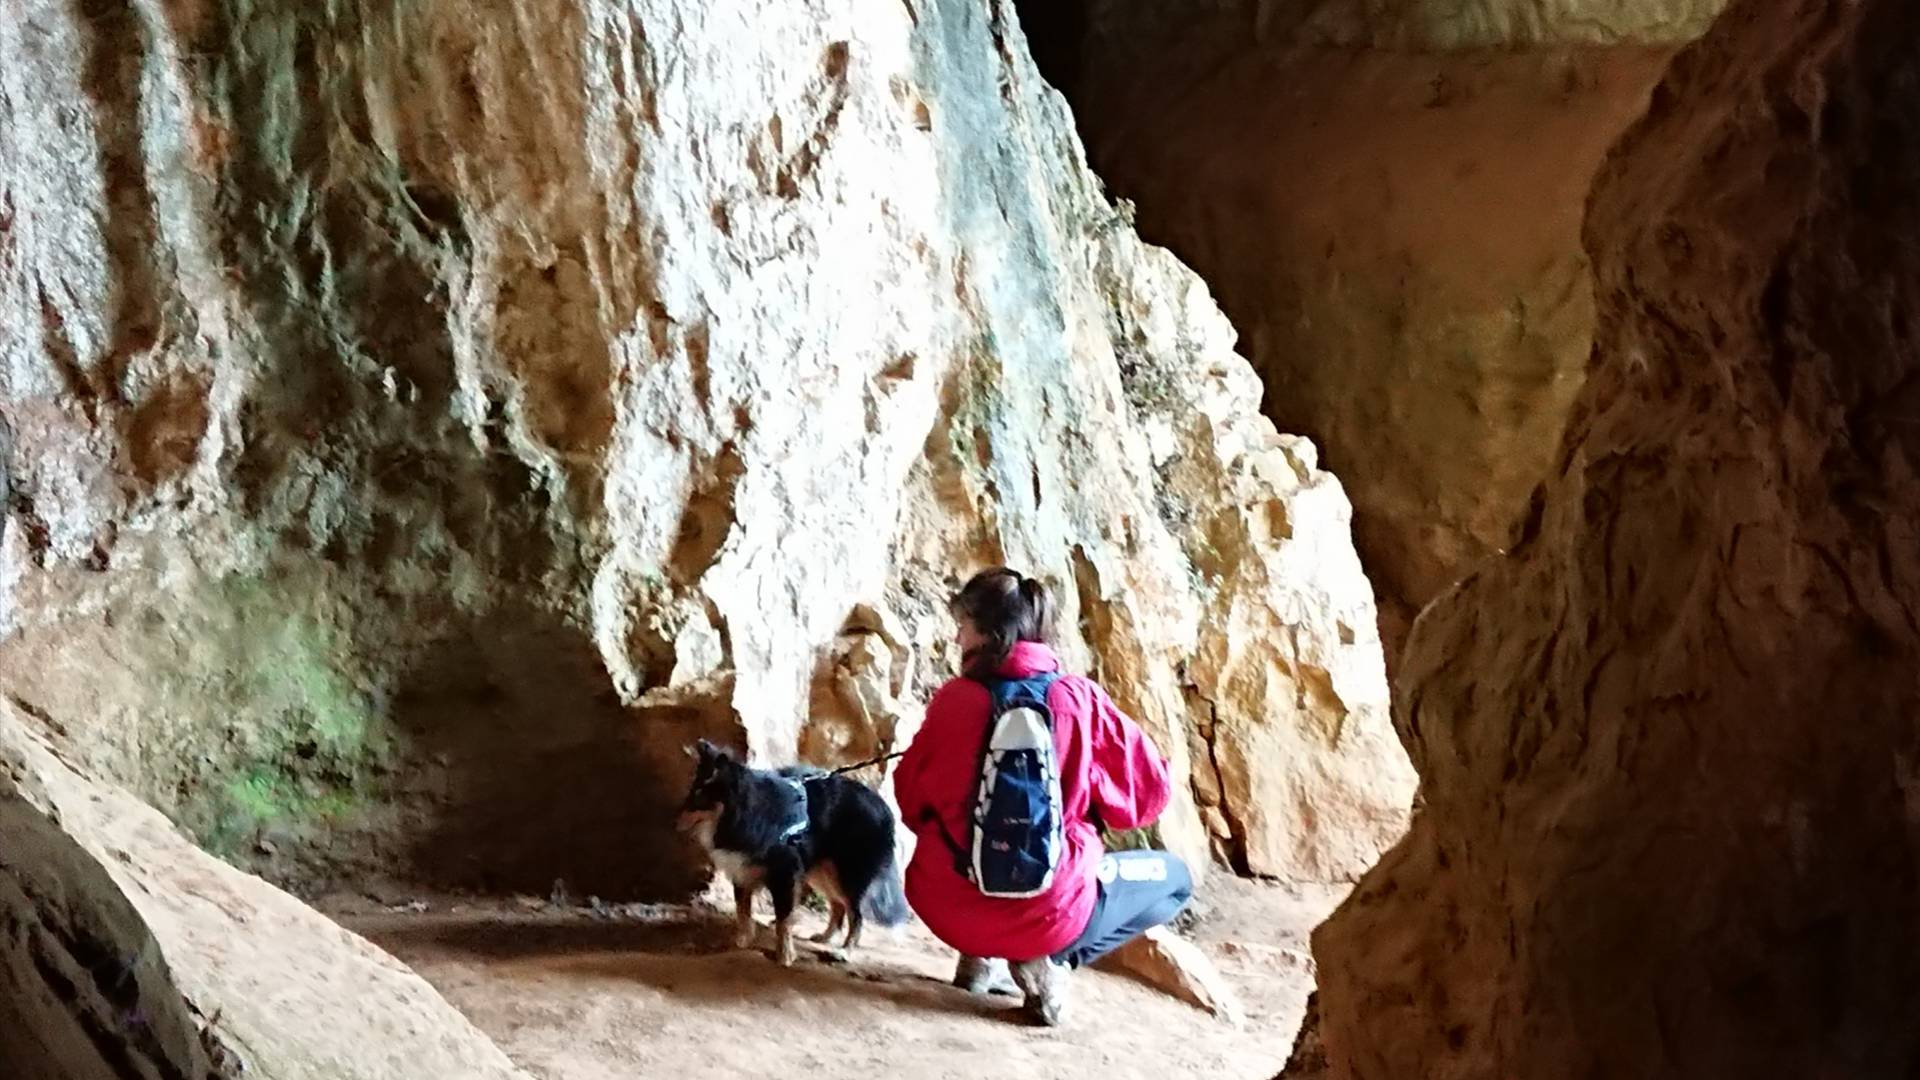 grotte-duhibou-millau15.jpg